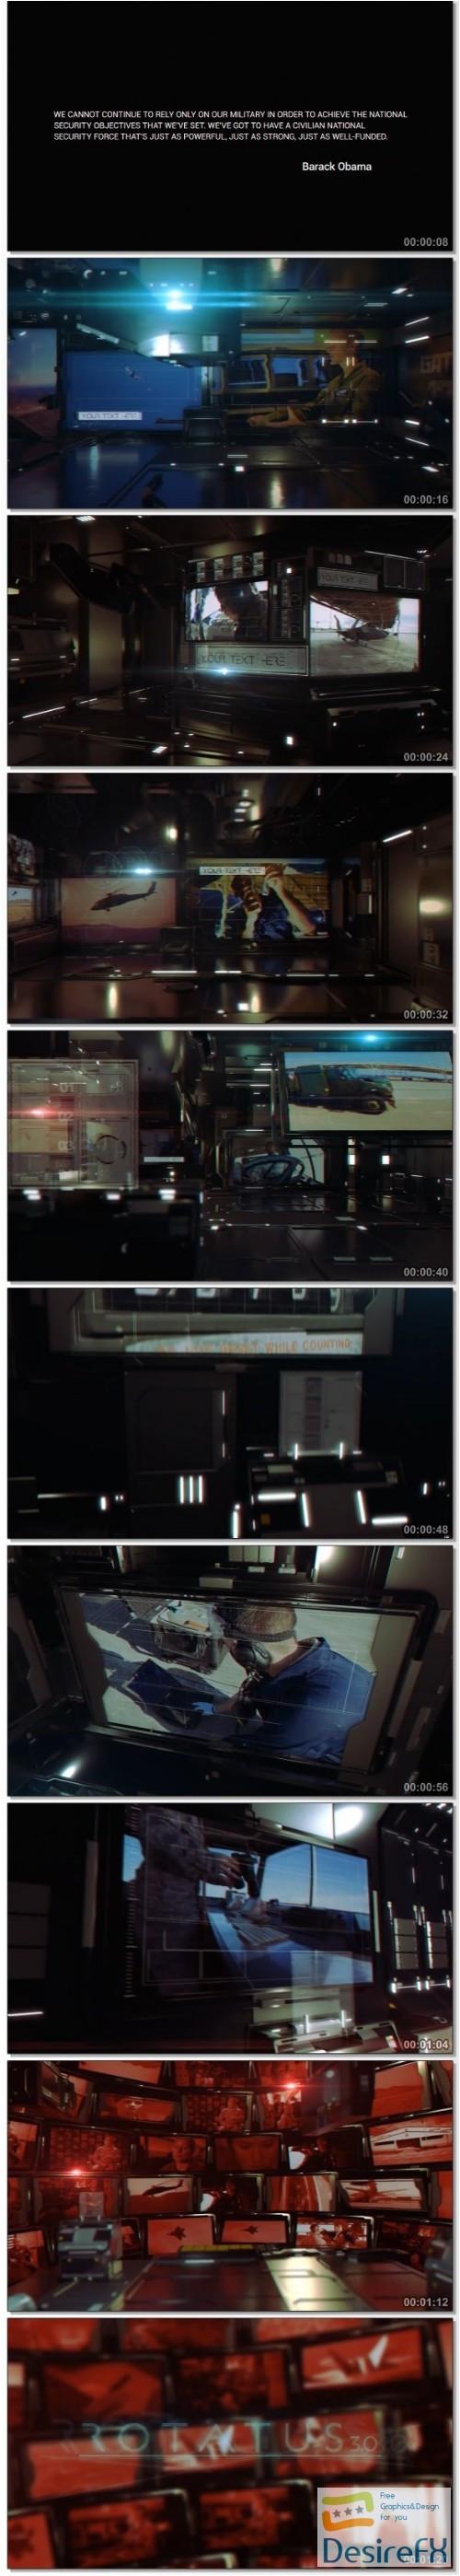 videohive rotatus 3 cinema 4d template 13576095